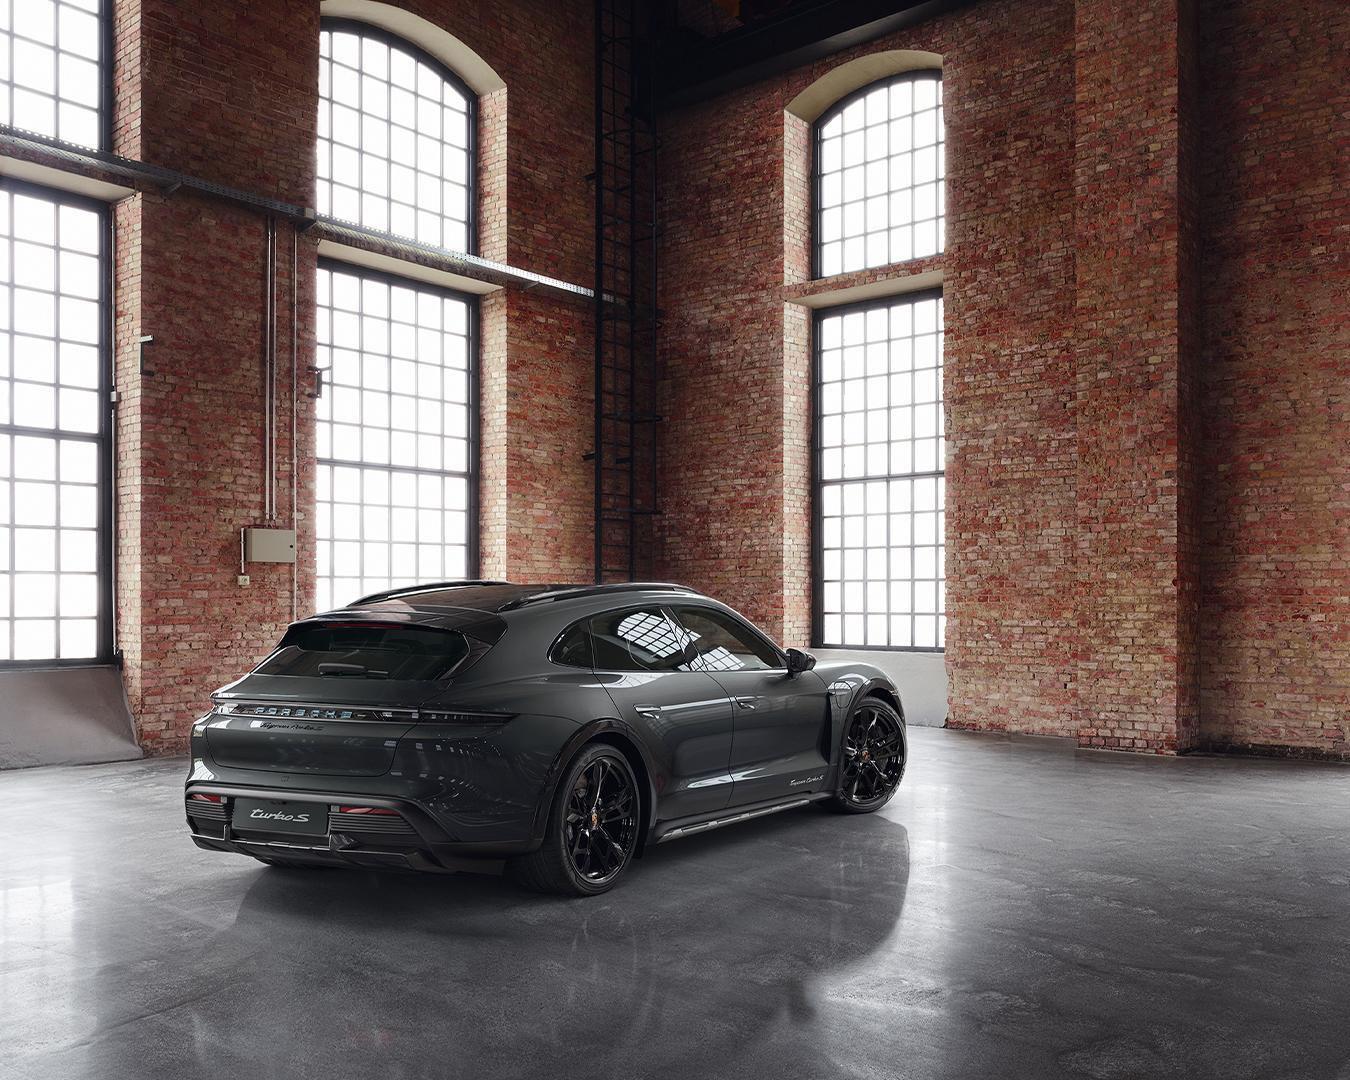 Porsche-Exclusive-Taycan-Cross-Turismo-3